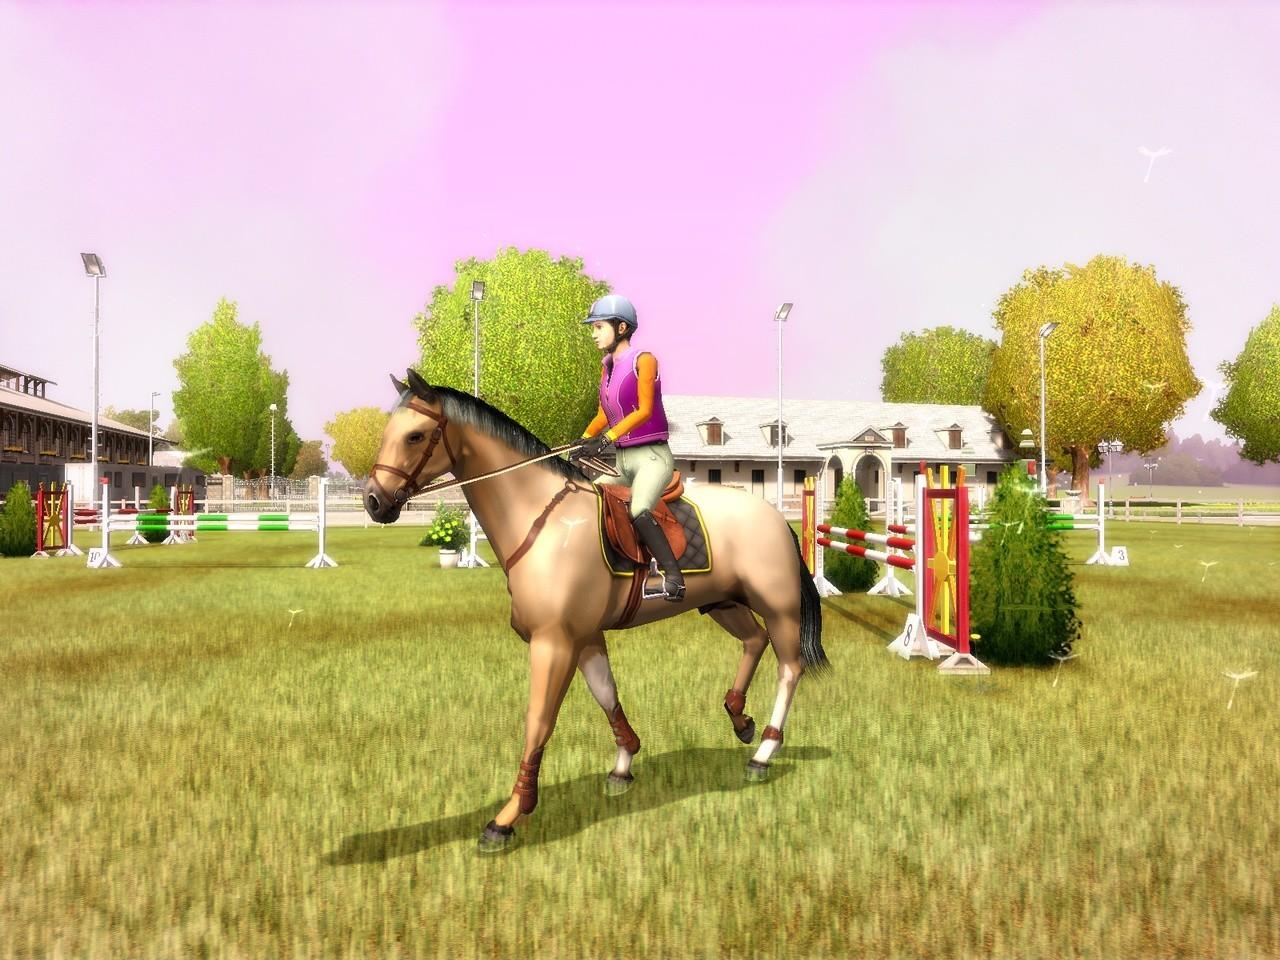 jeux cheval ps4